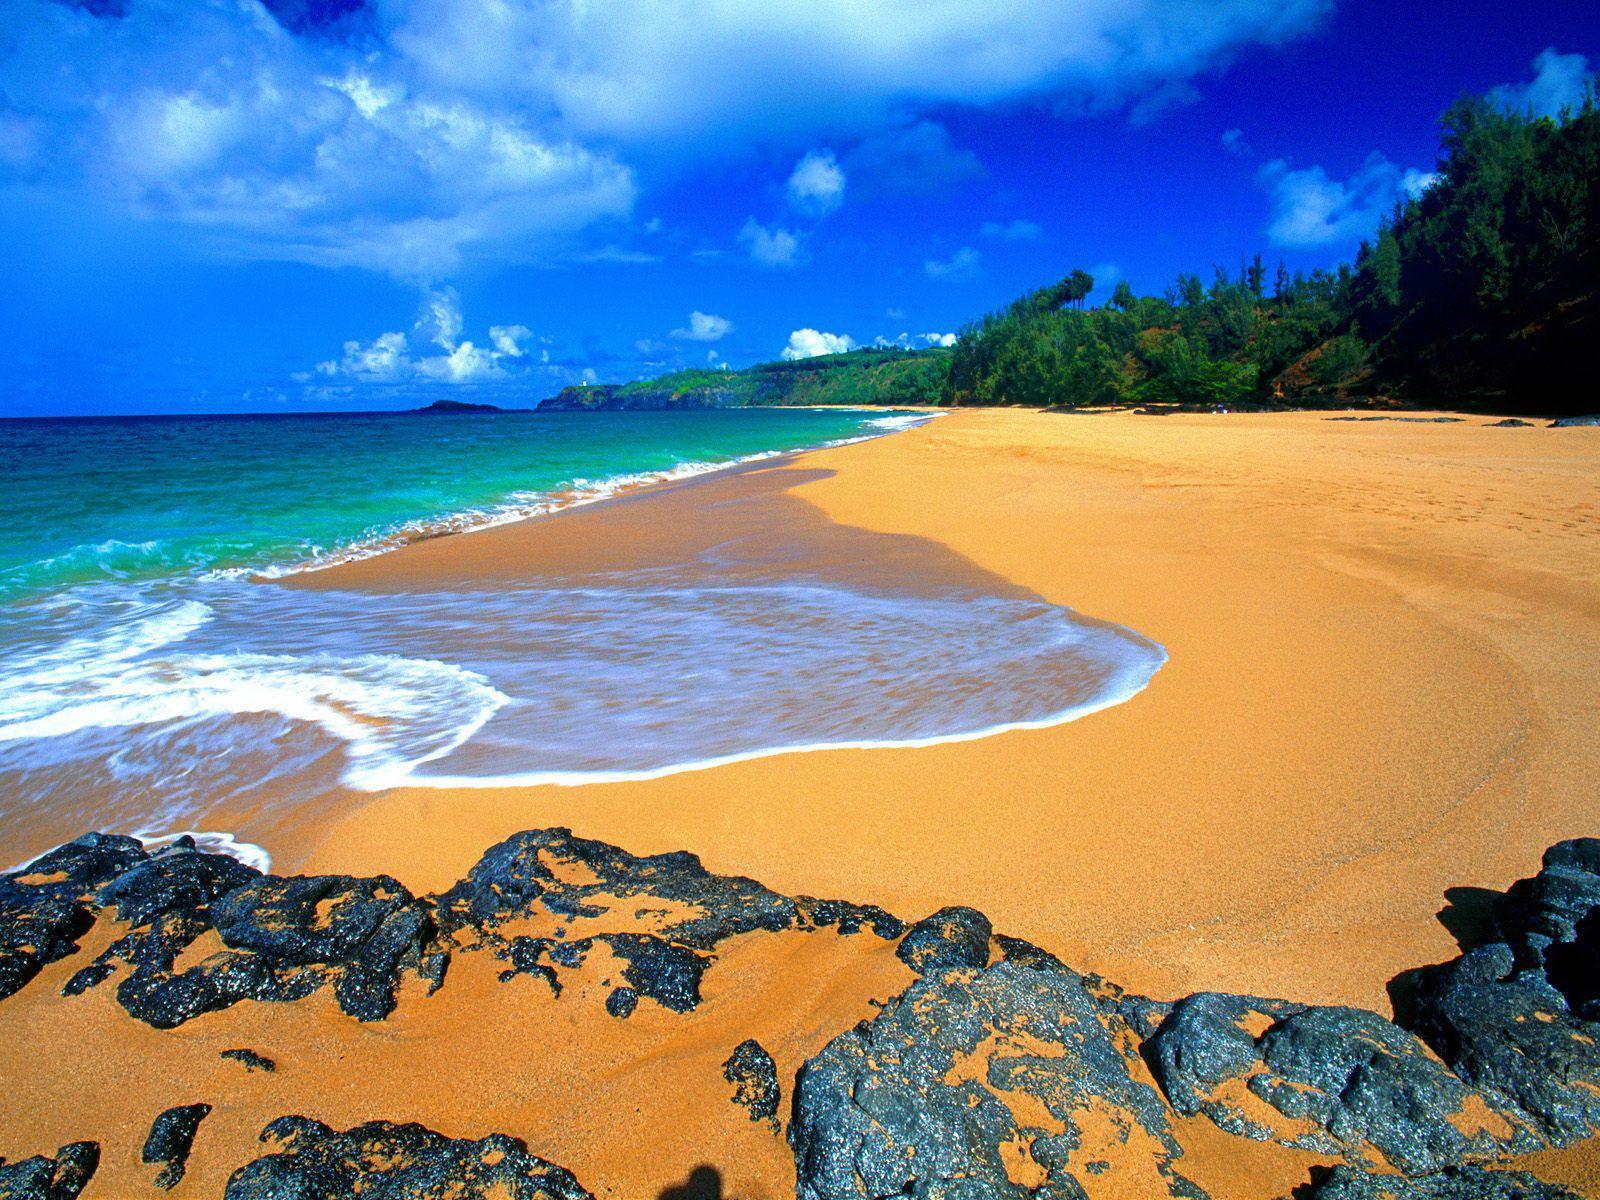 Kauai Hawaii United States  city photos : secret beach kauai hawaii united states wallpaper